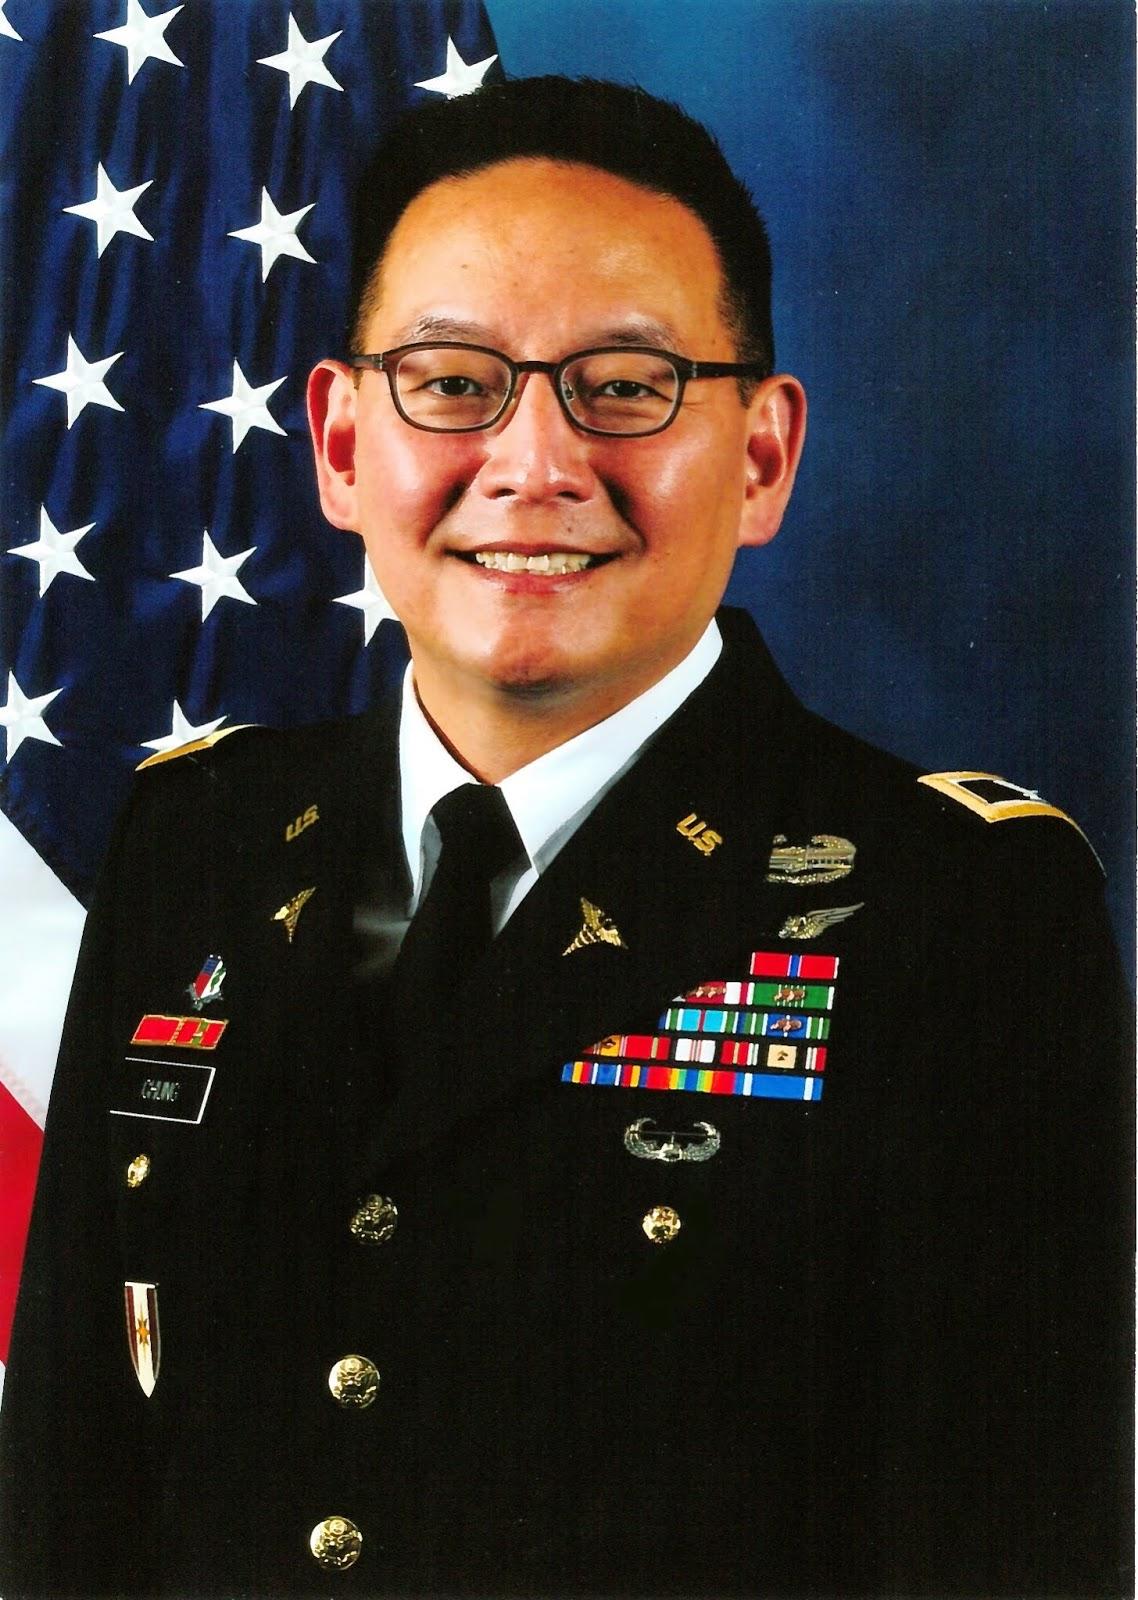 Chung's military headshot